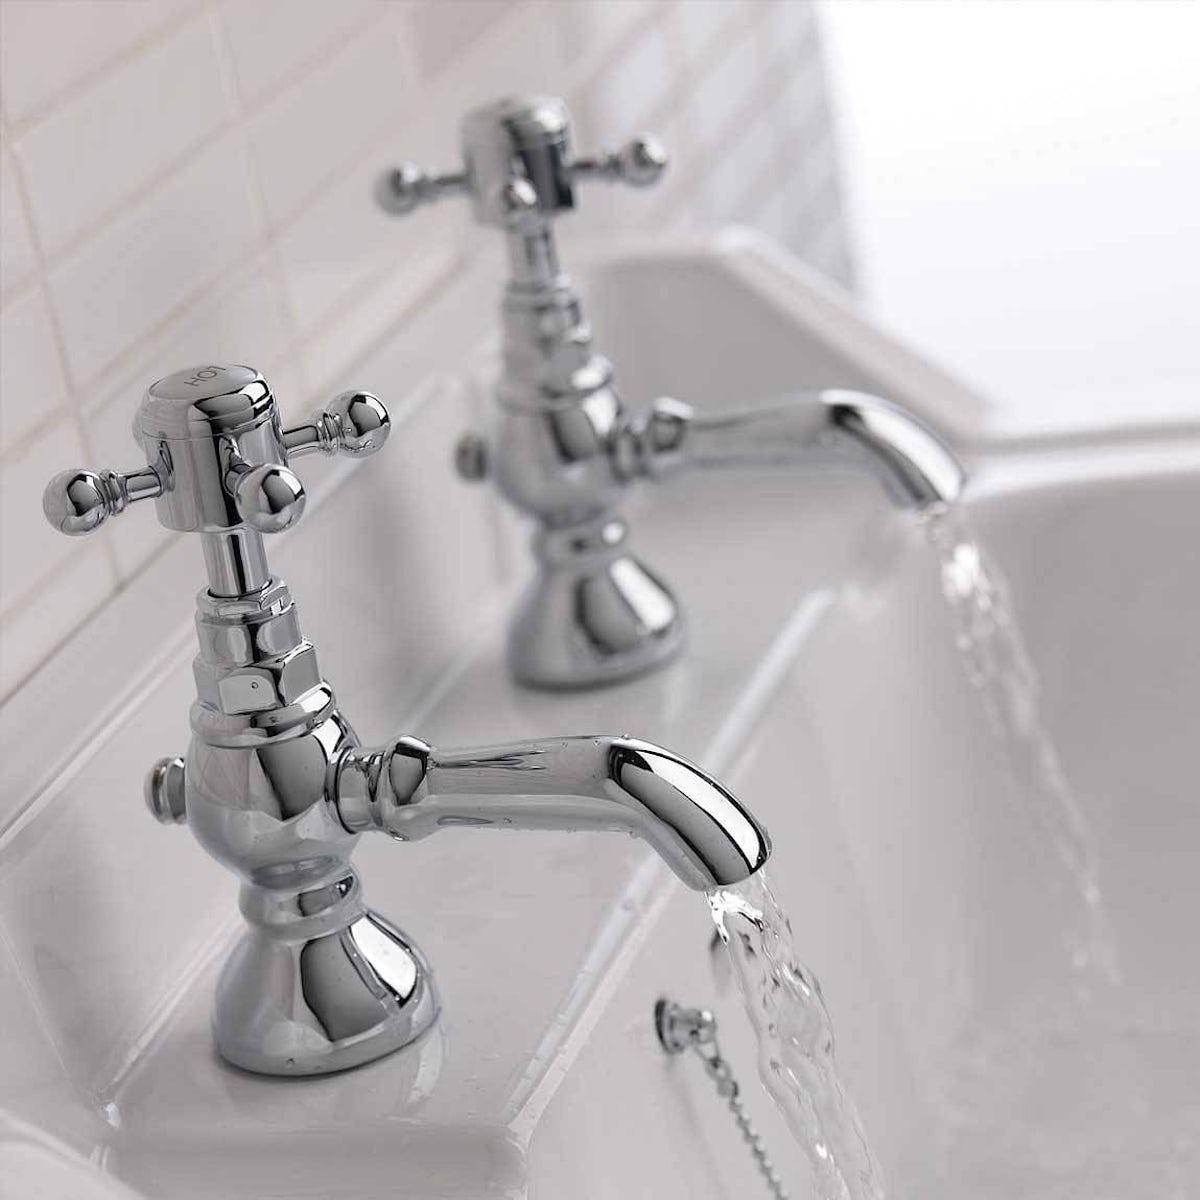 100 bath tap shower attachment tara bath spa fitting bath tap shower attachment the bath co coniston basin tap and freestanding bath shower